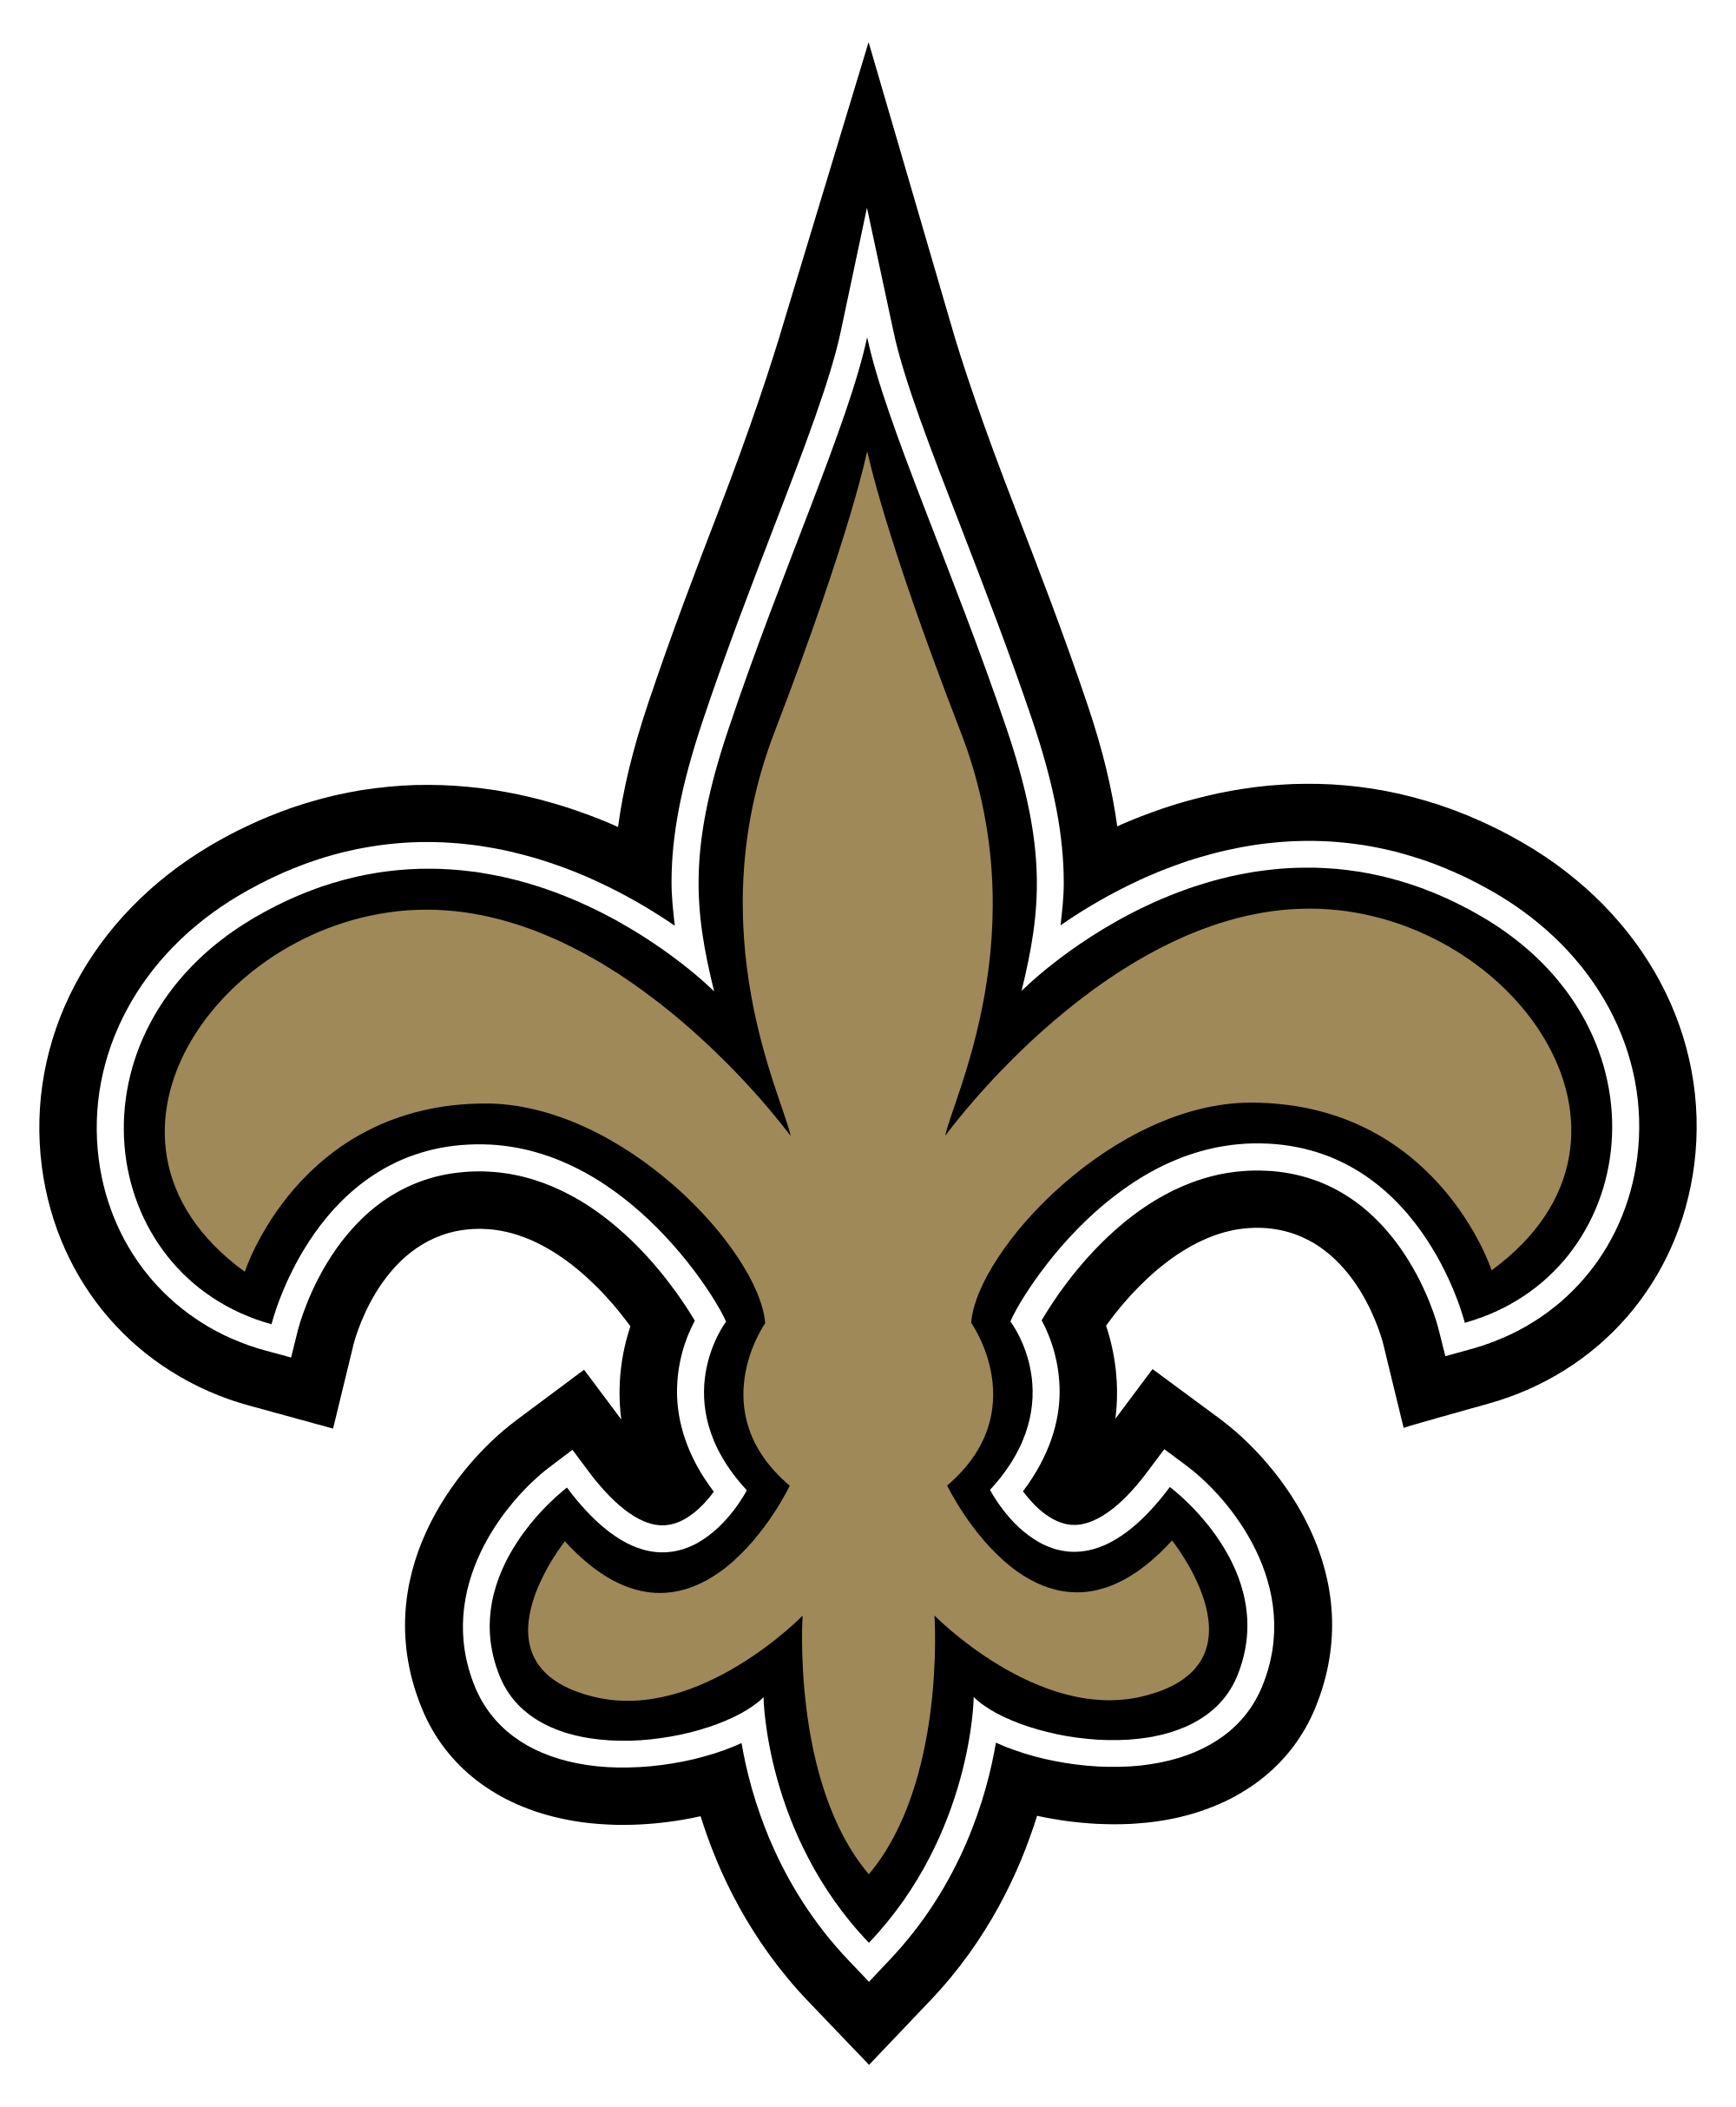 New Orleans Saints Logo New Orleans Saints Logo New Orleans Saints New Orleans